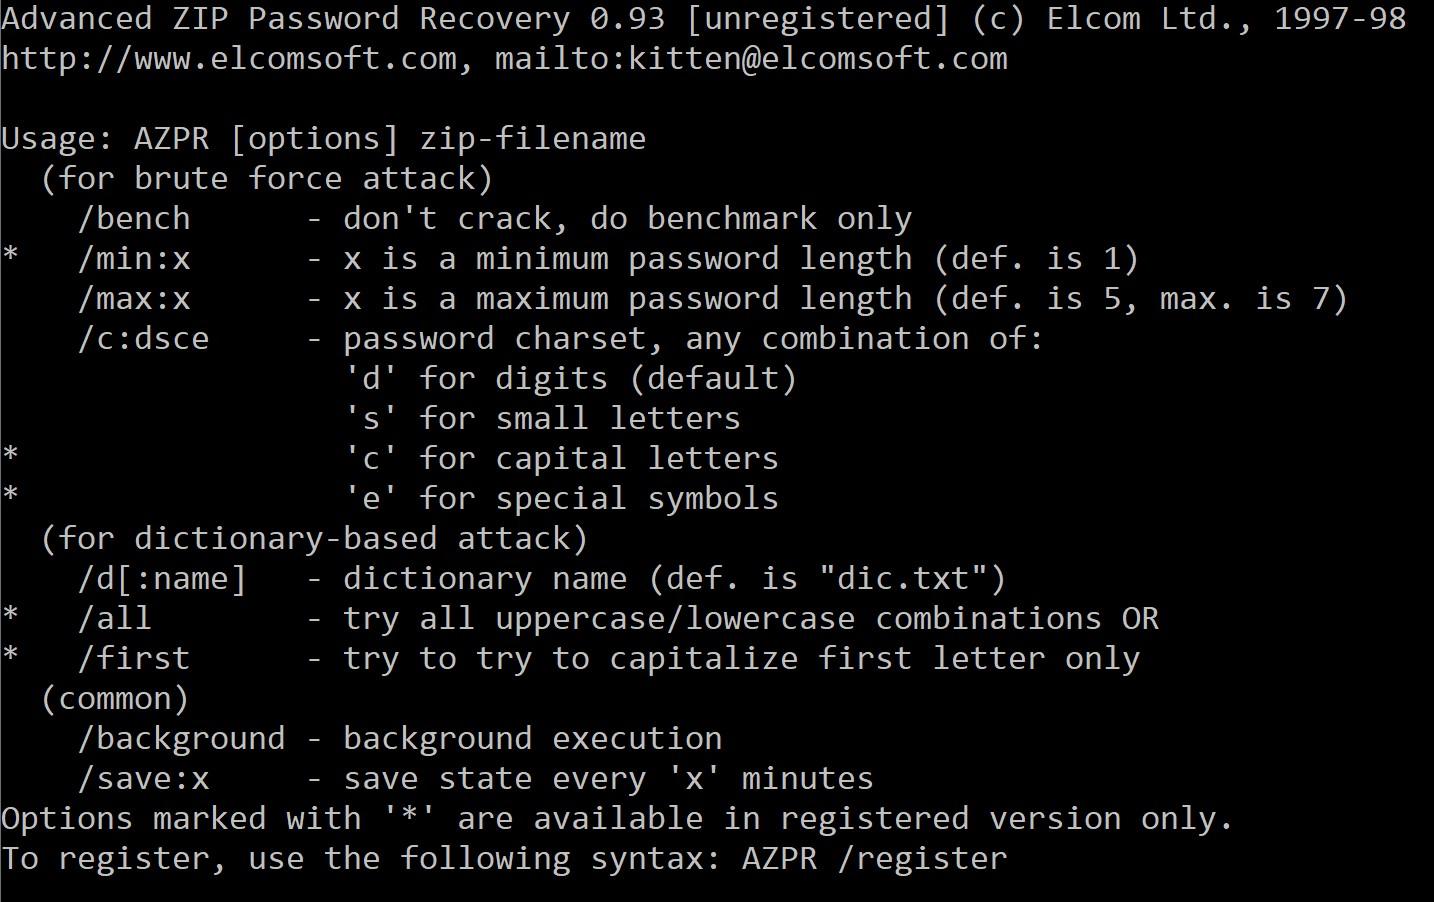 Advanced Zip Password Recovery Şifre Kırma Aracı